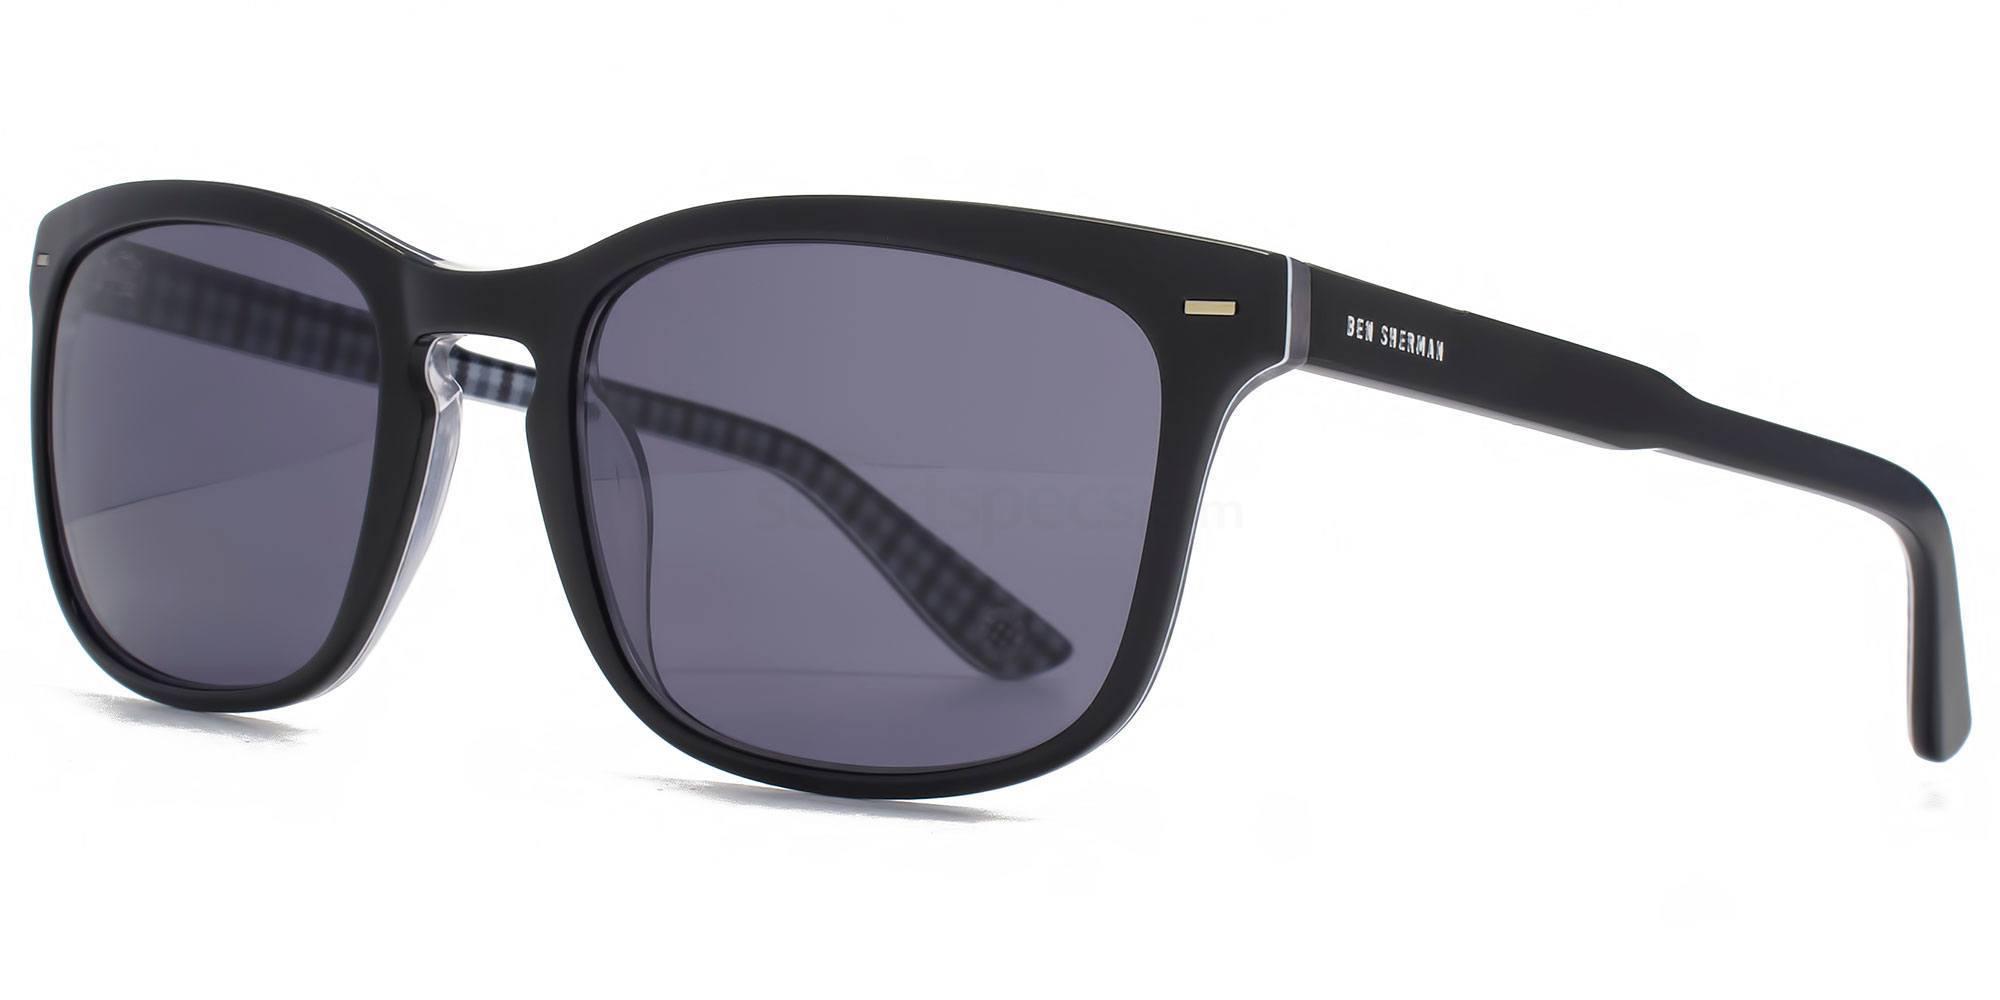 BLK BENP002 - PETER Sunglasses, Ben Sherman